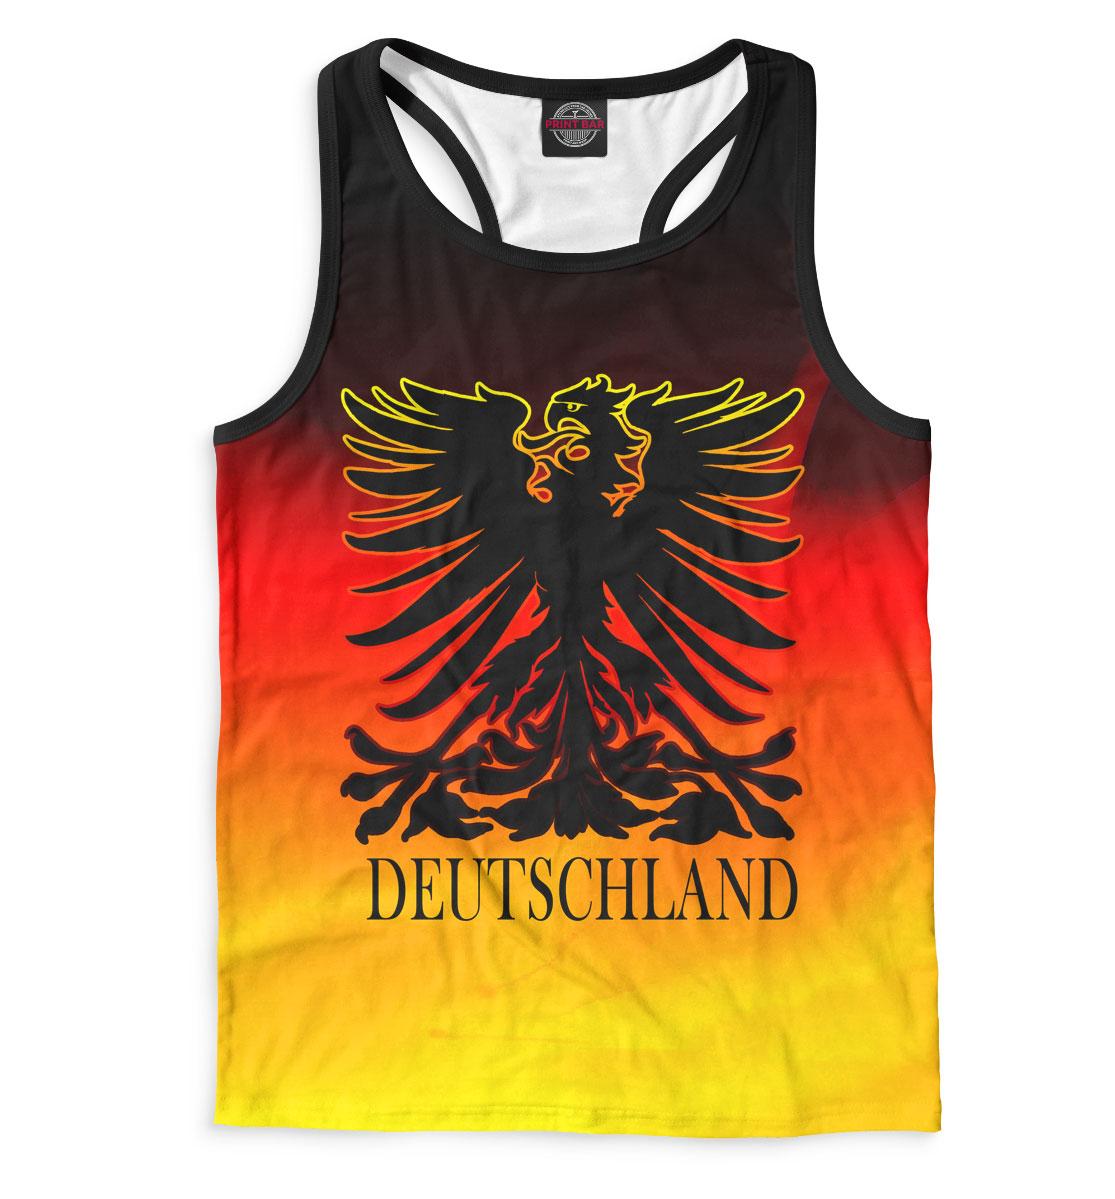 Купить Германия, Printbar, Майки борцовки, CTS-697155-mayb-2